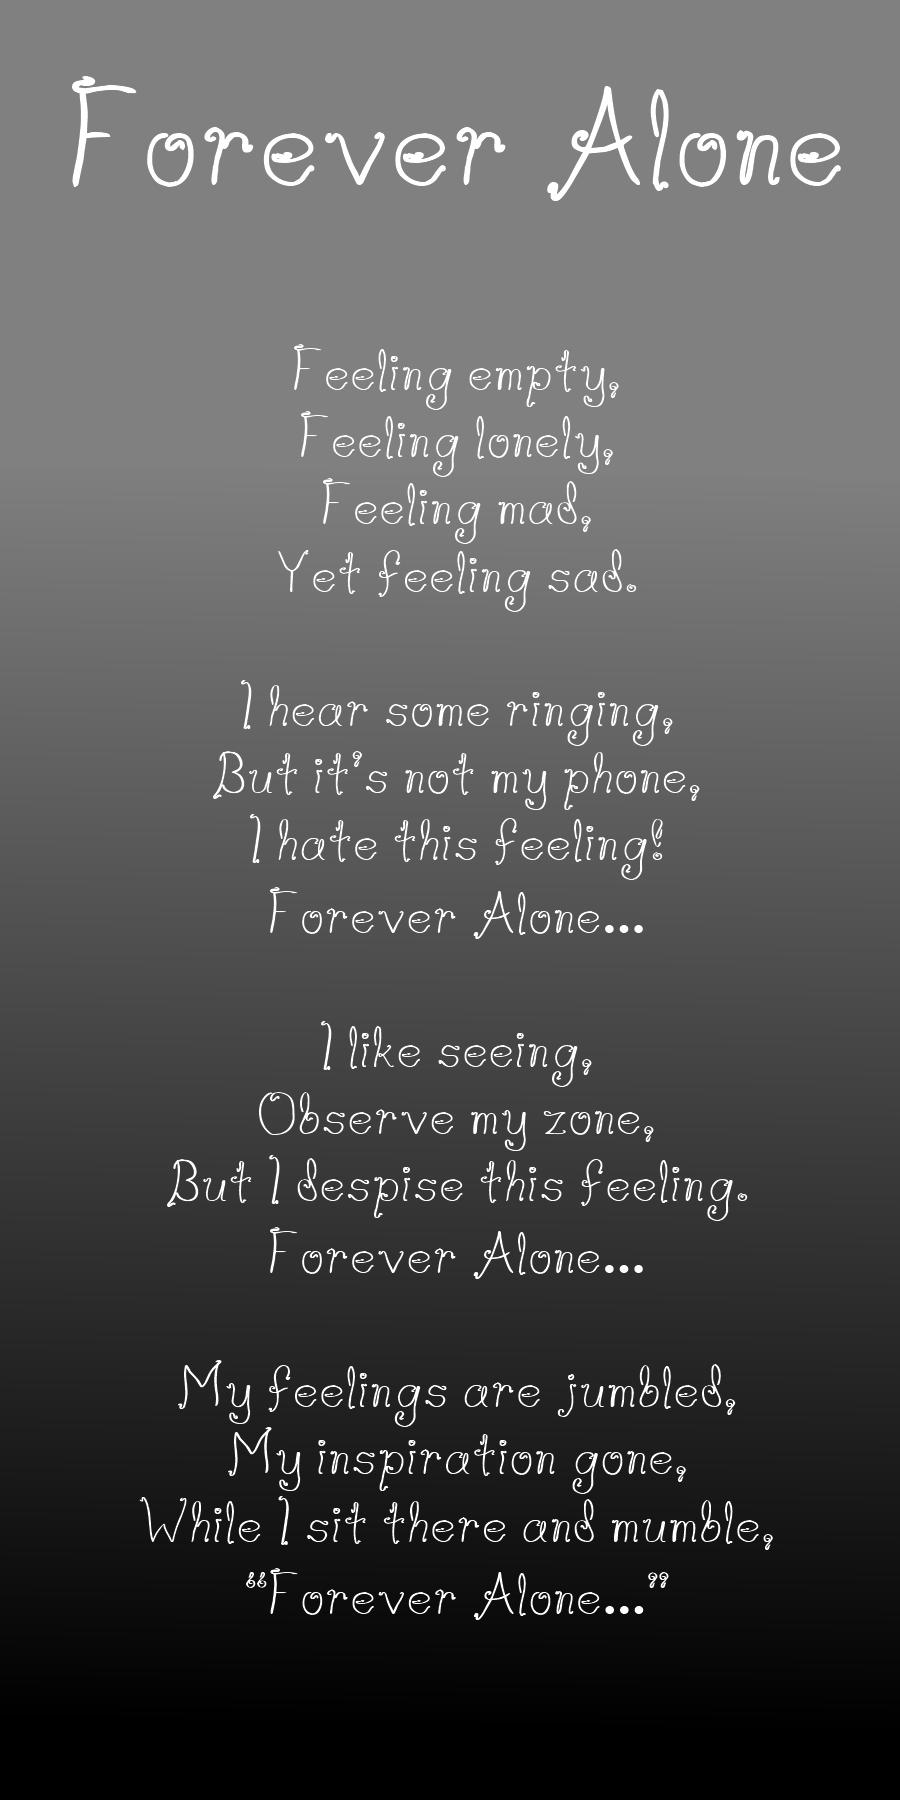 Forever Alone Quotes. QuotesGram